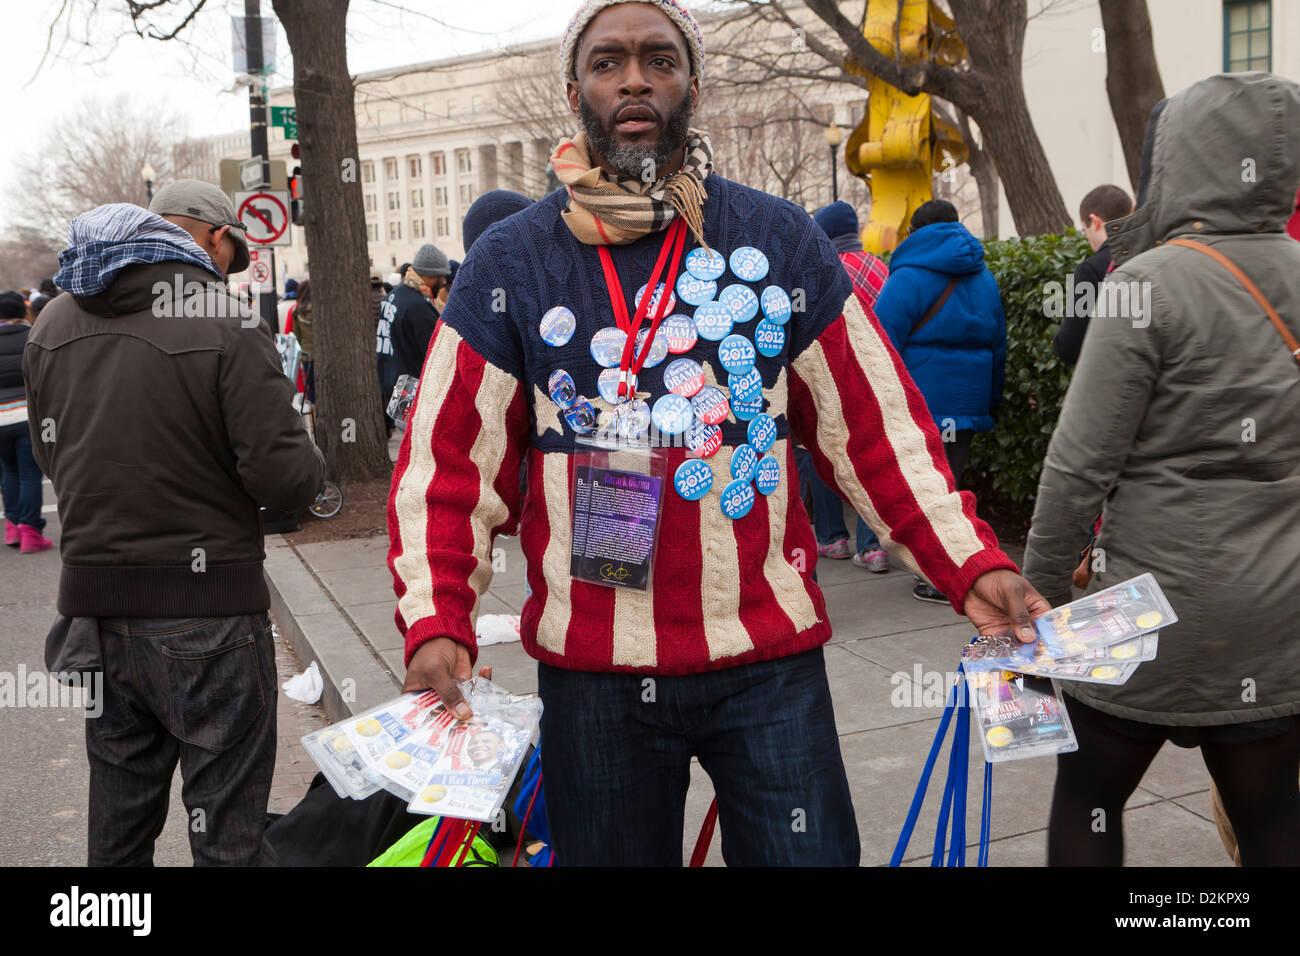 Man selling Obama 2012 Inauguration memorabilia in Washington DC - Stock Image